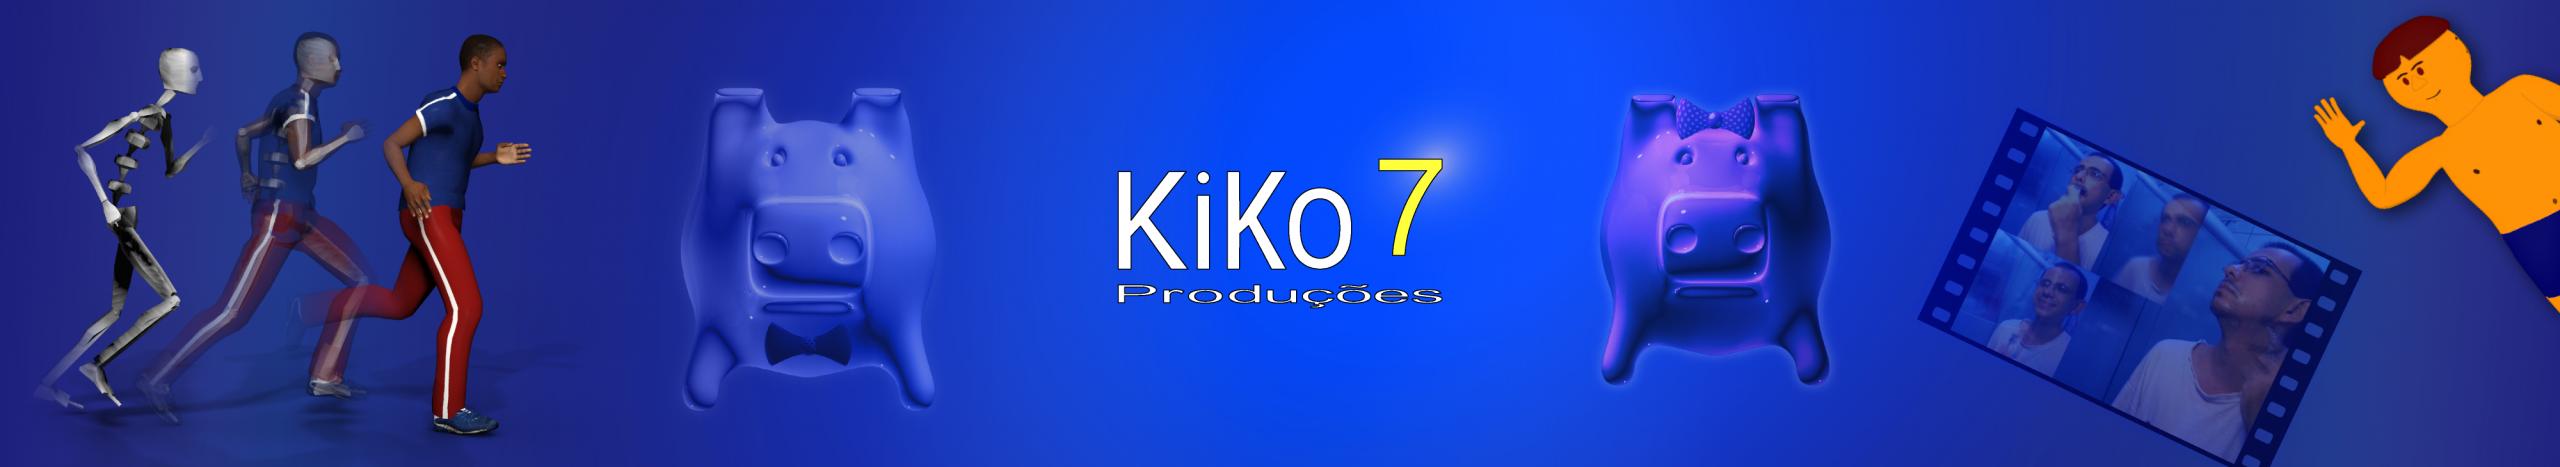 Kiko 7 Produções